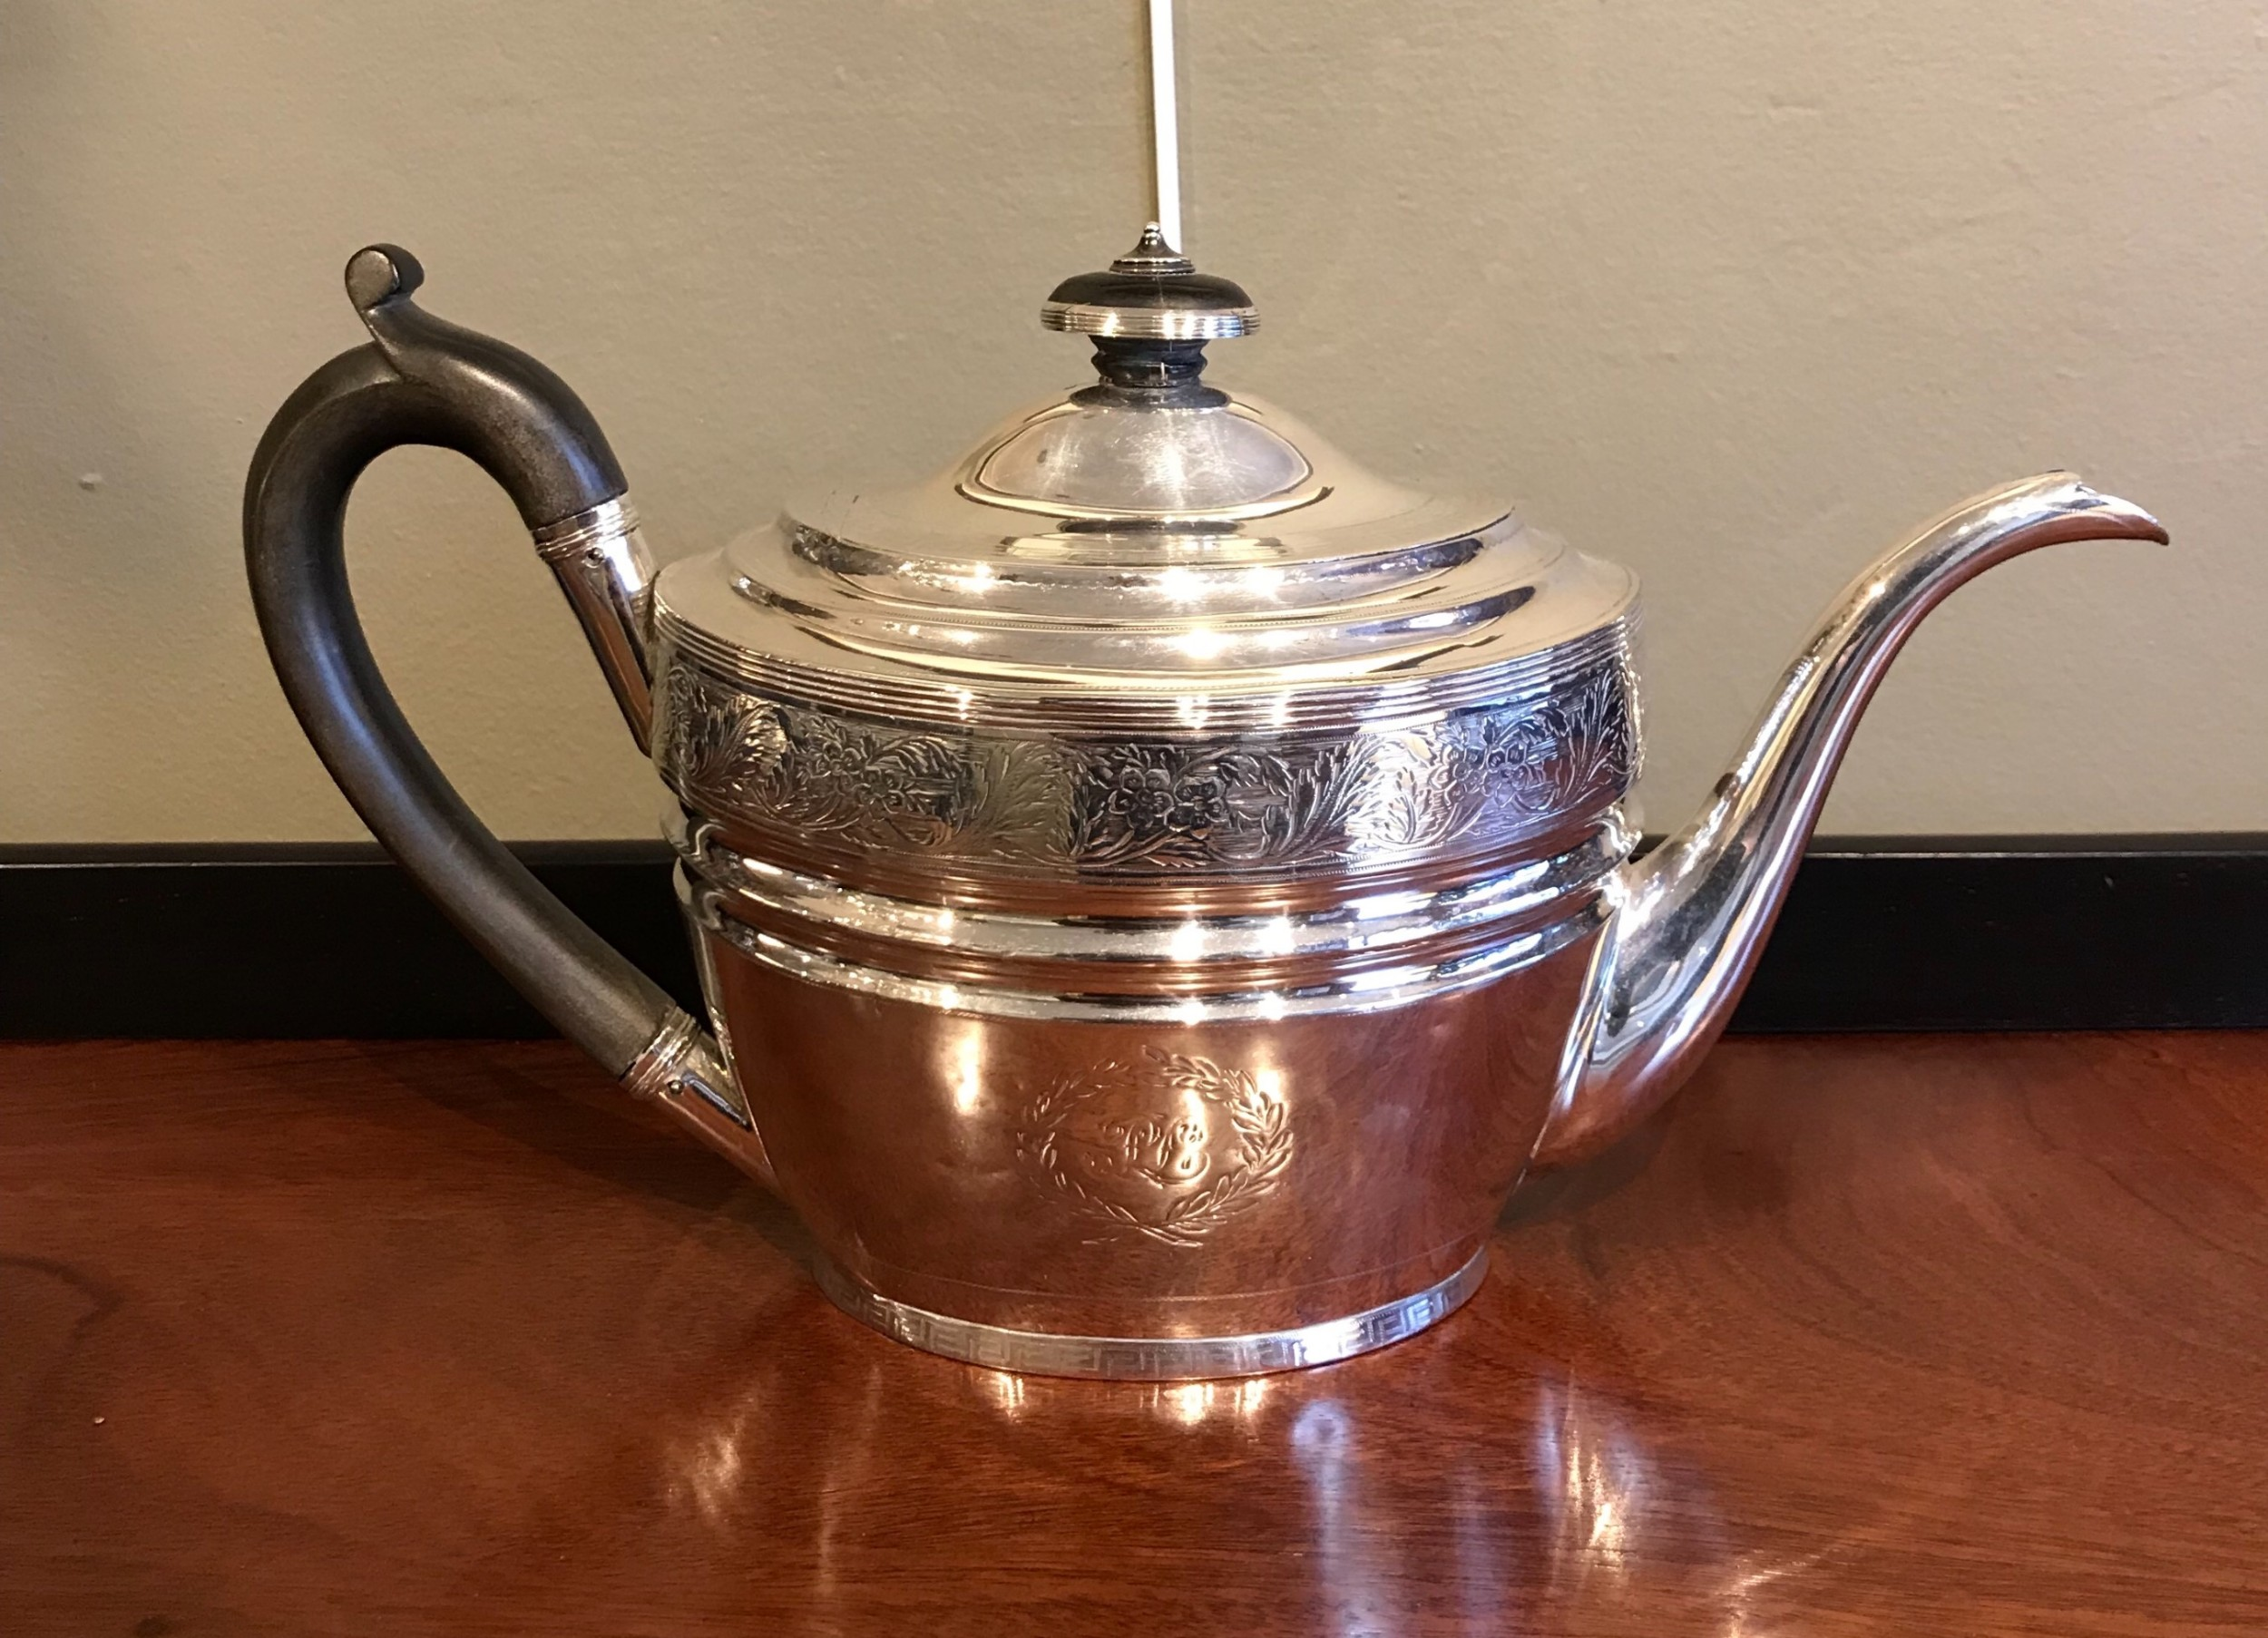 scottish georgian silver teapot edinburgh 1802 by william patrick cunningham